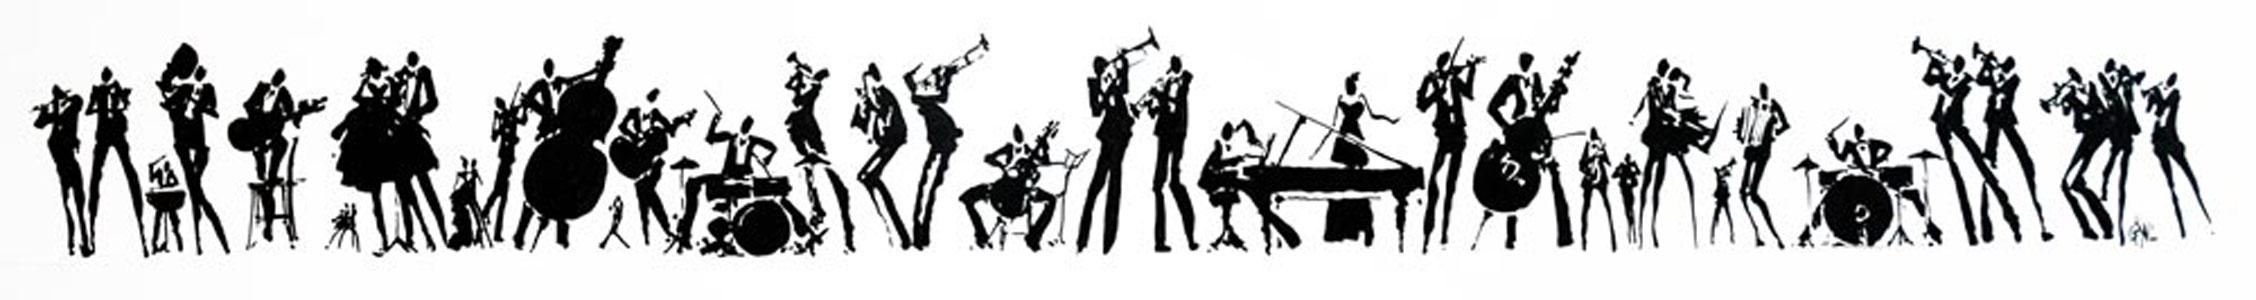 orchestre-1.jpg